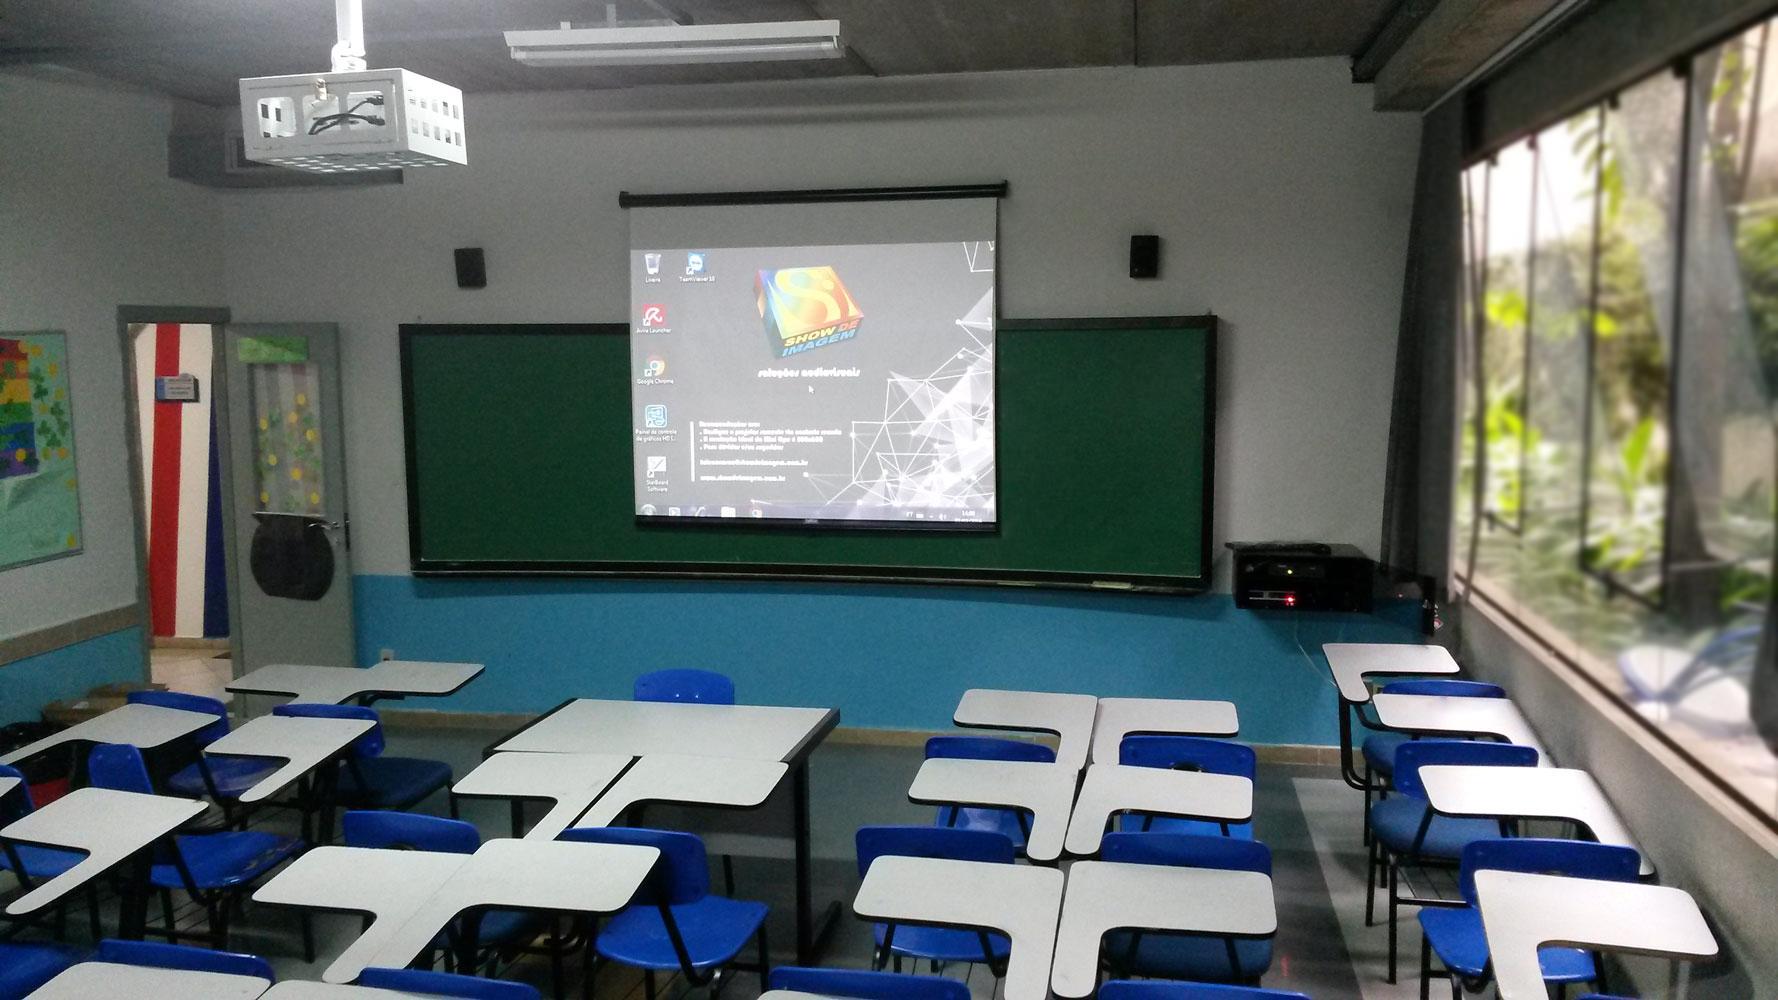 colegio-drummond-sala-multimidia03